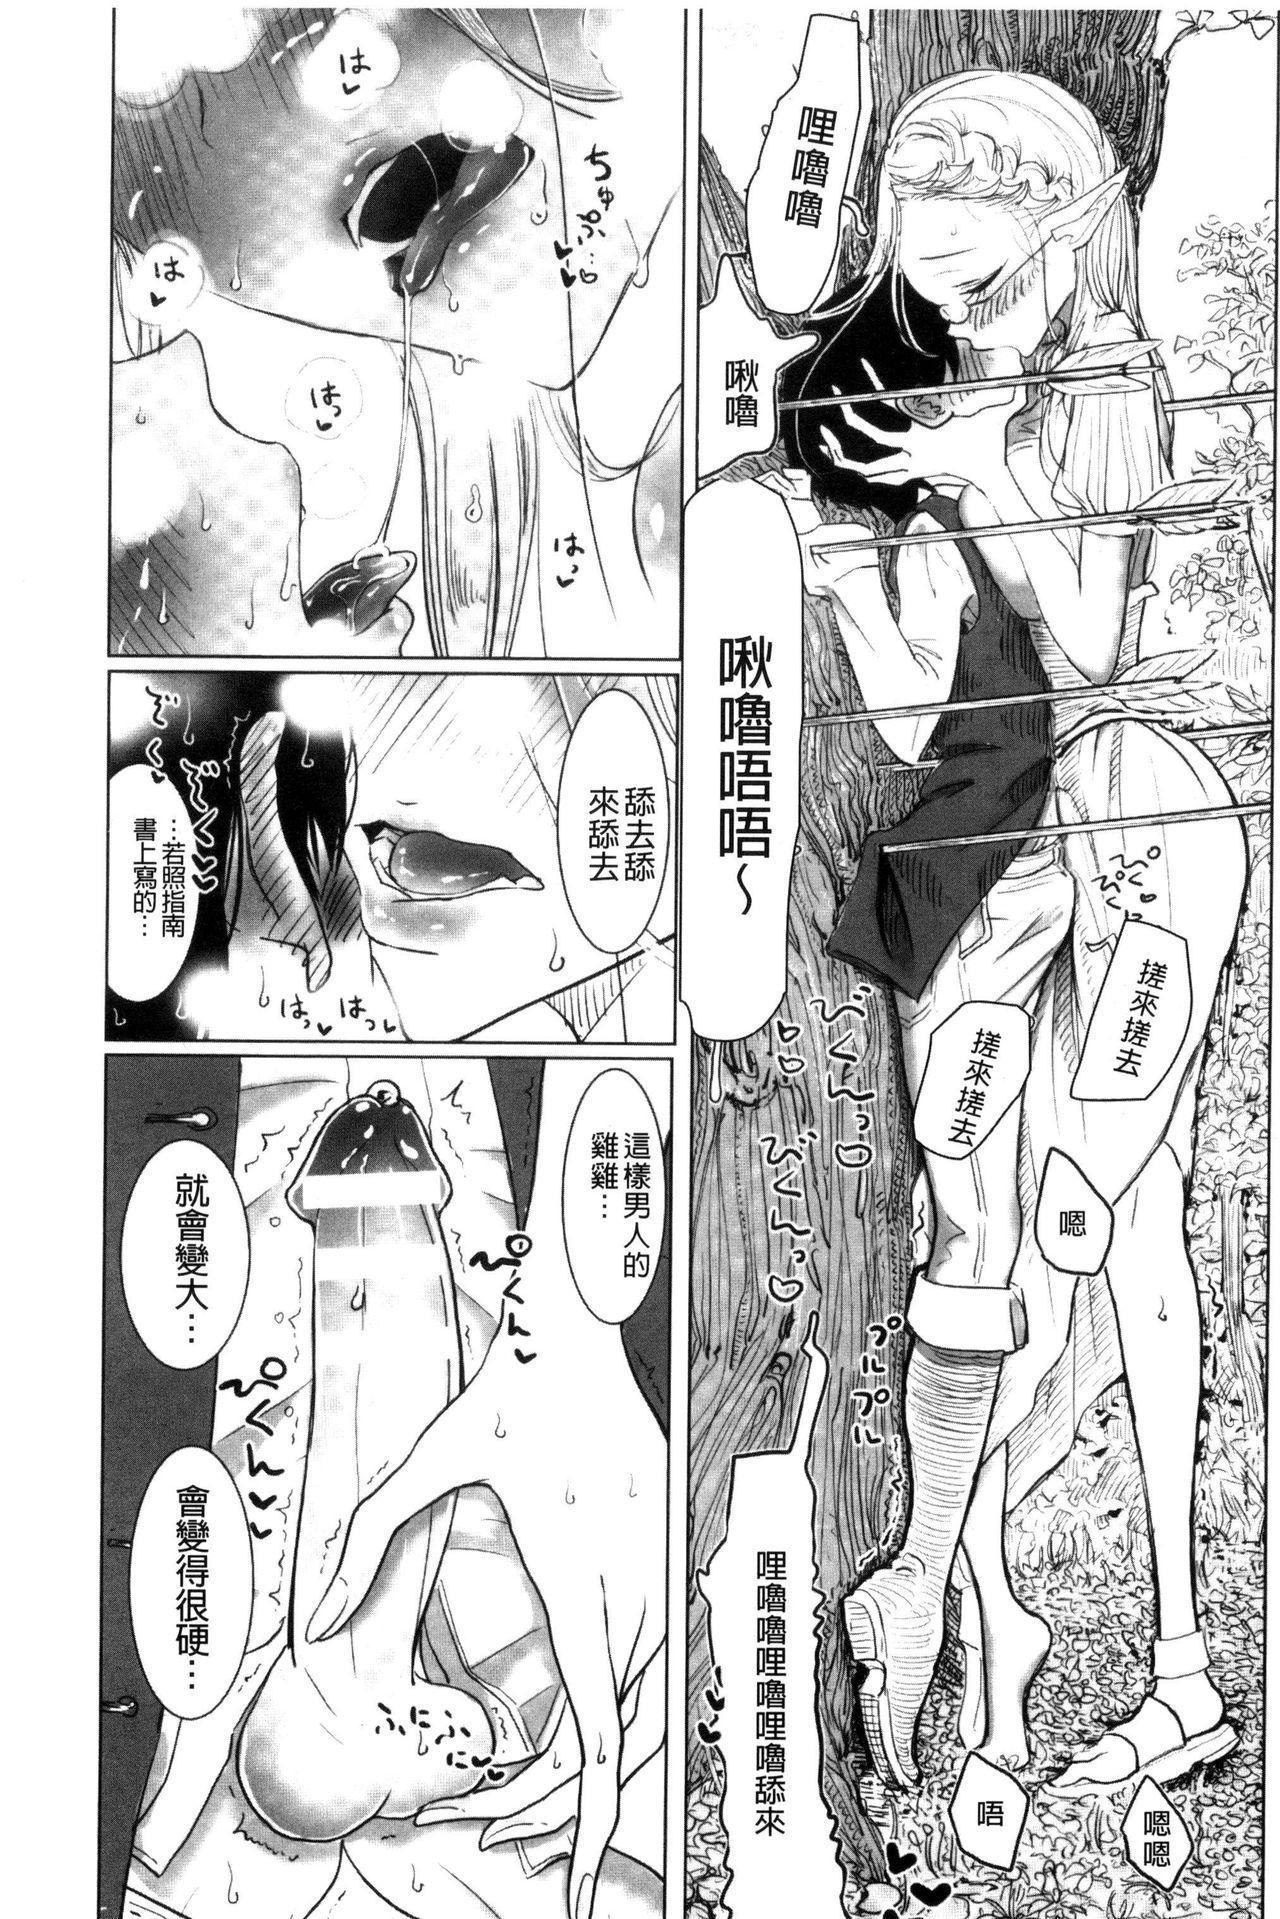 [Dhibi] Sono Yubisaki de Korogashite - Please Caress it at the Finger-tip. [Chinese] 116